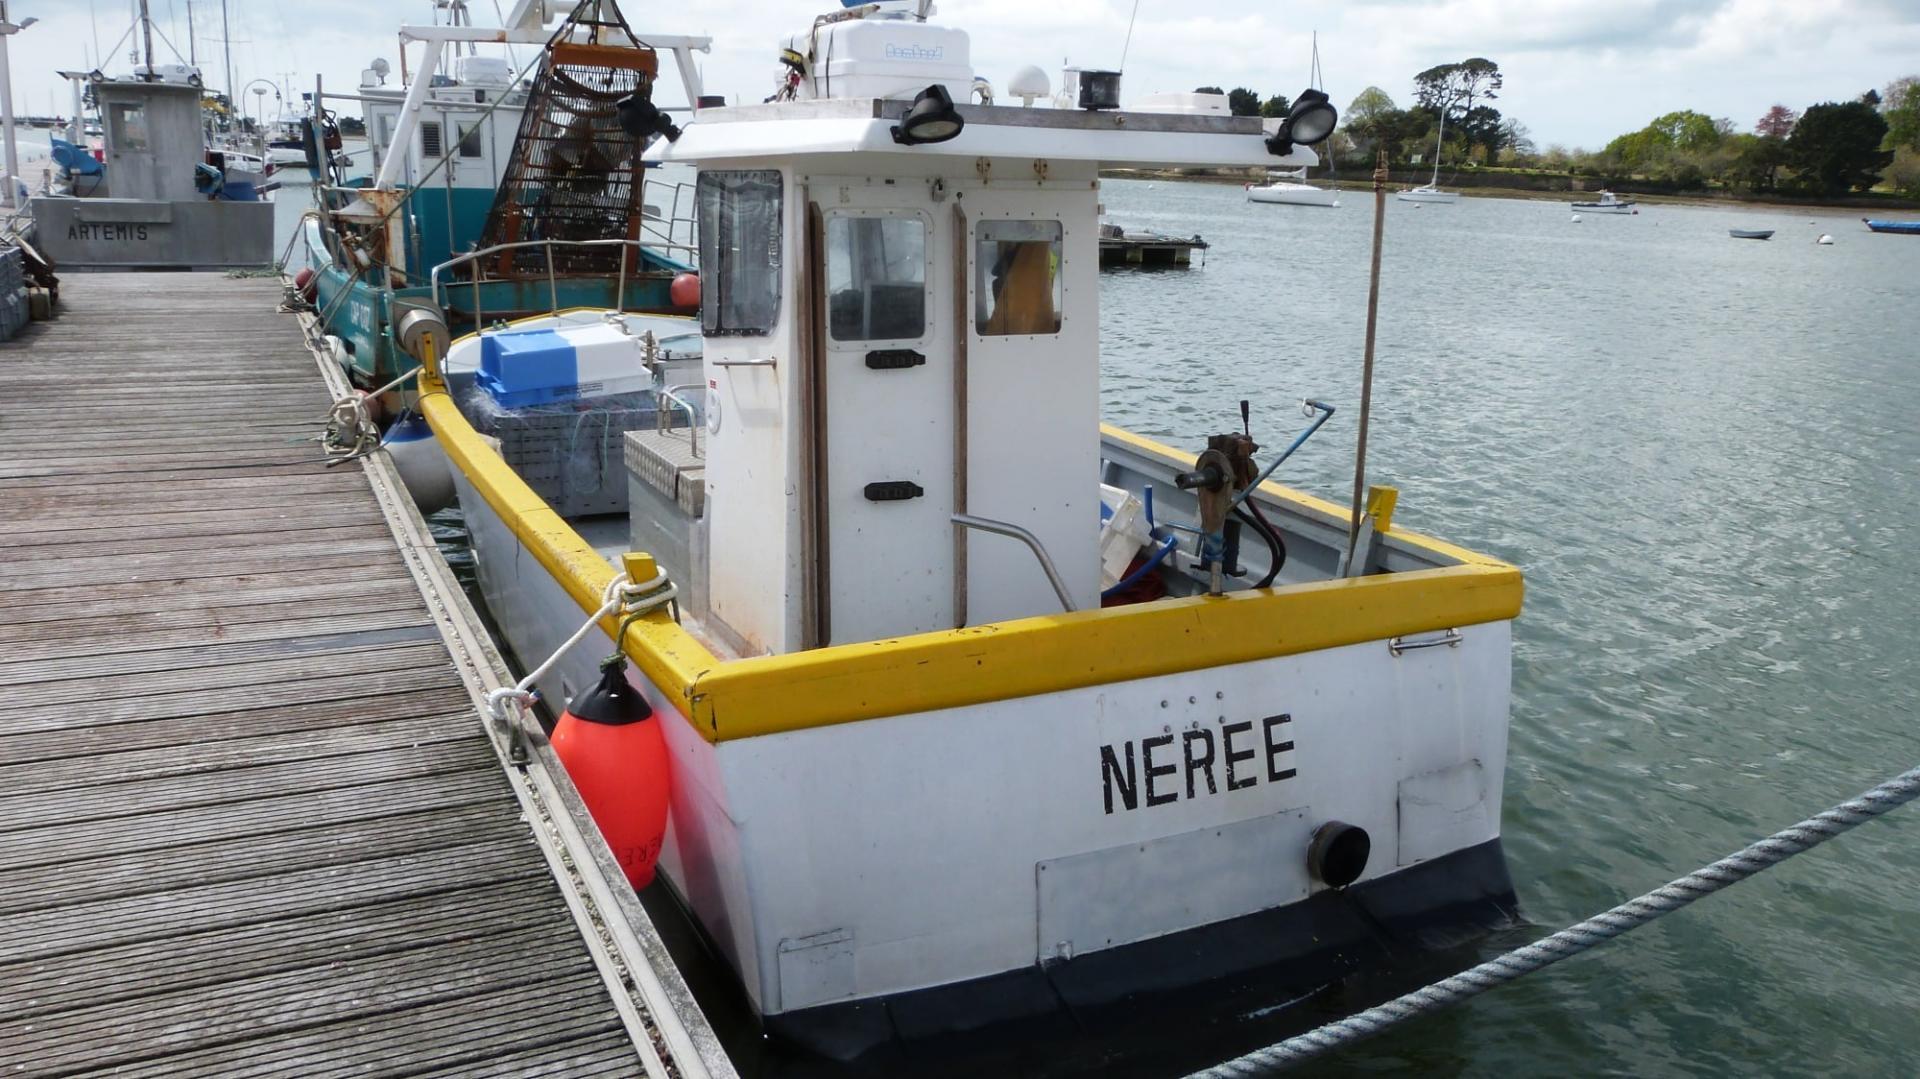 Neree cc642461 fabrice roperch